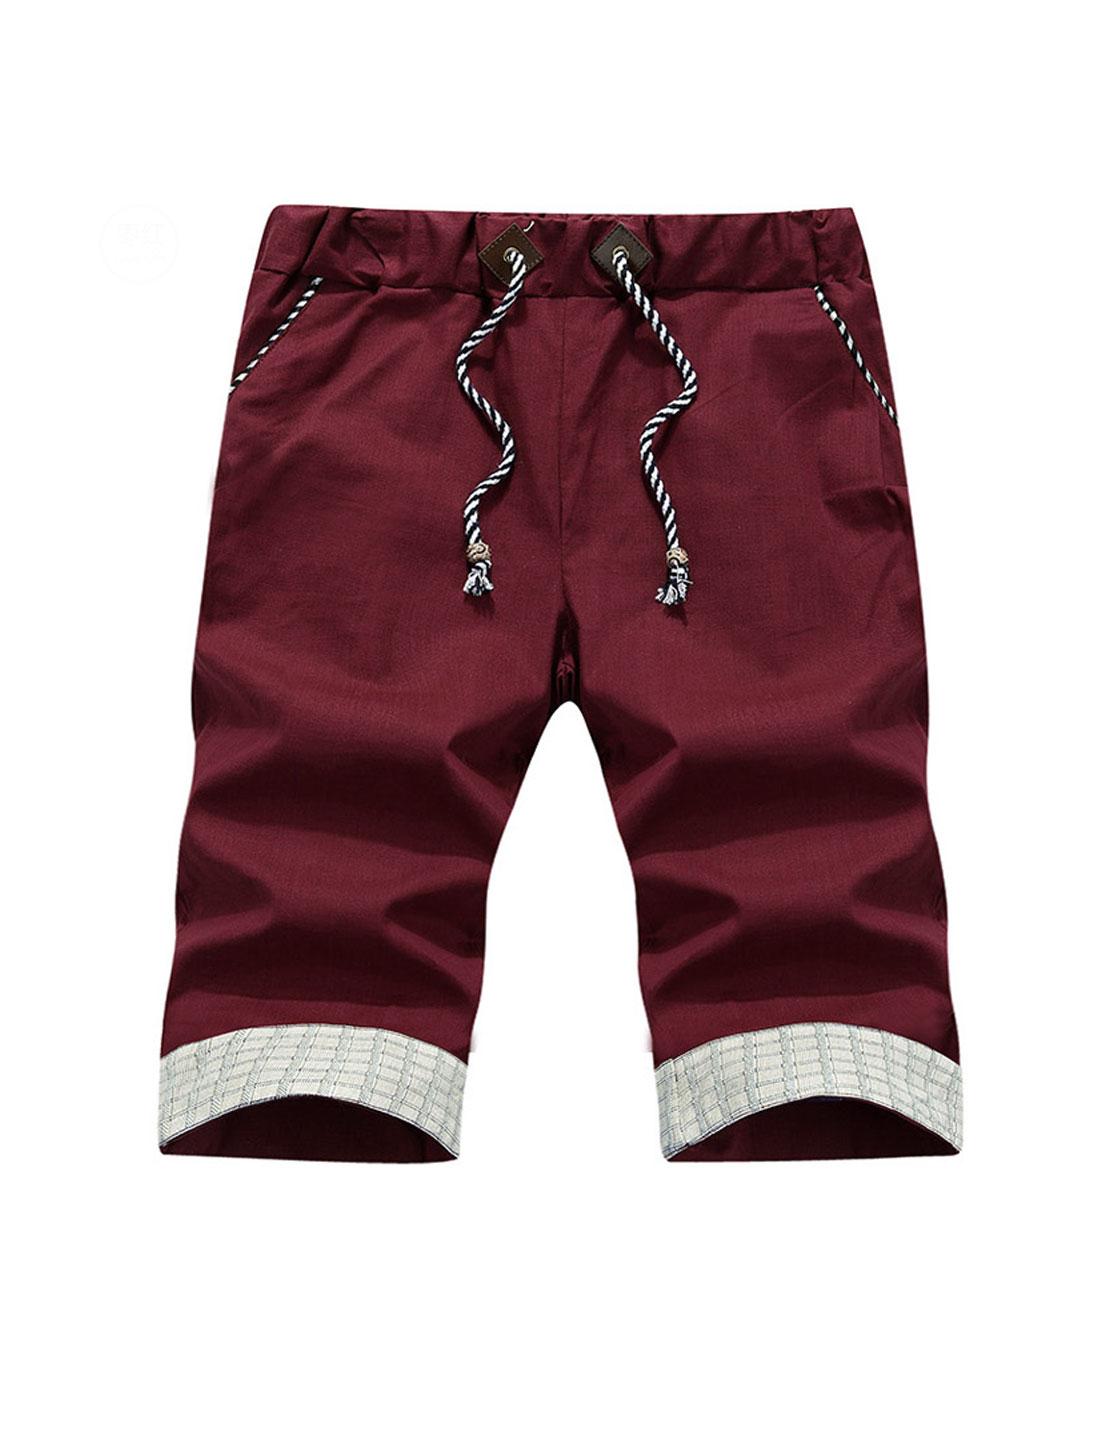 Man Stretchy Waist Plaids Detail Casual Shorts Burgundy W32